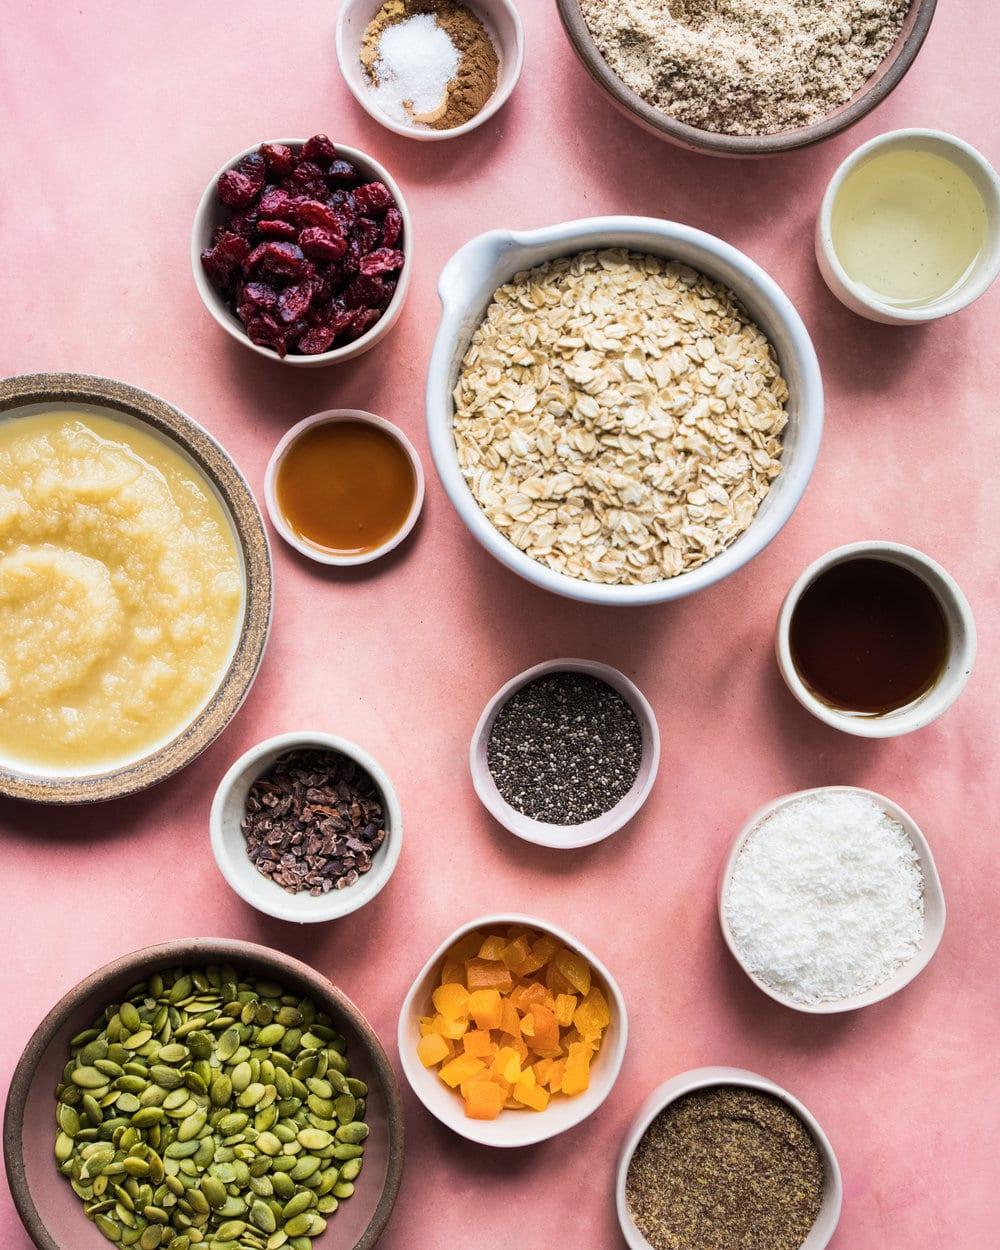 Spiced Breakfast Cookies (Vegan, Gluten-Free)